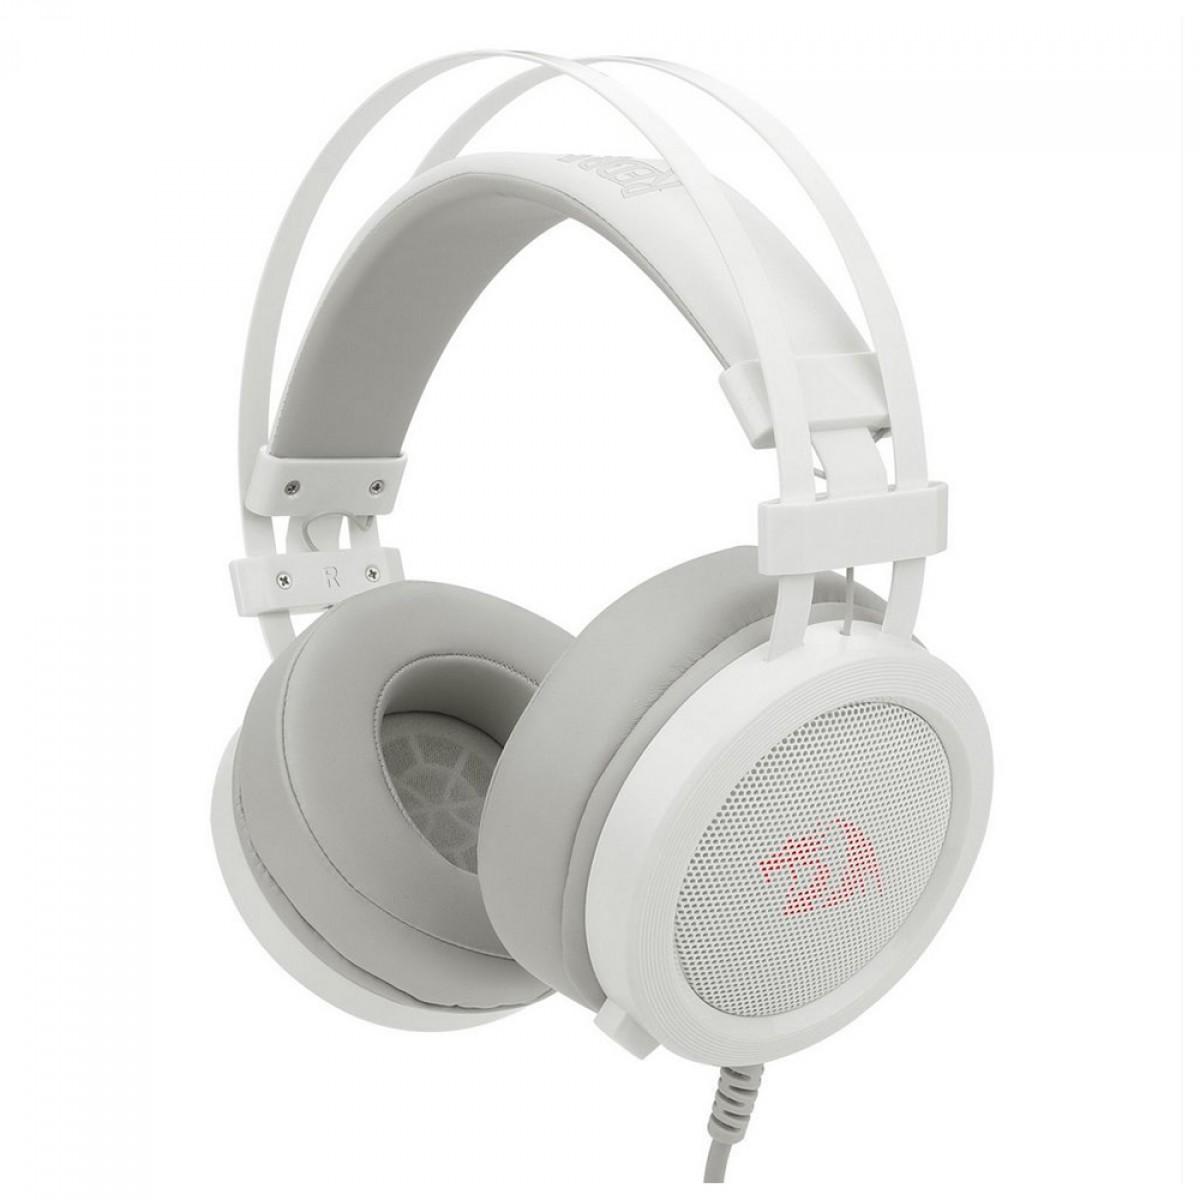 Headset Gamer Redragon Scylla Lunar White, P2, Múltiplas Plataformas, H901W